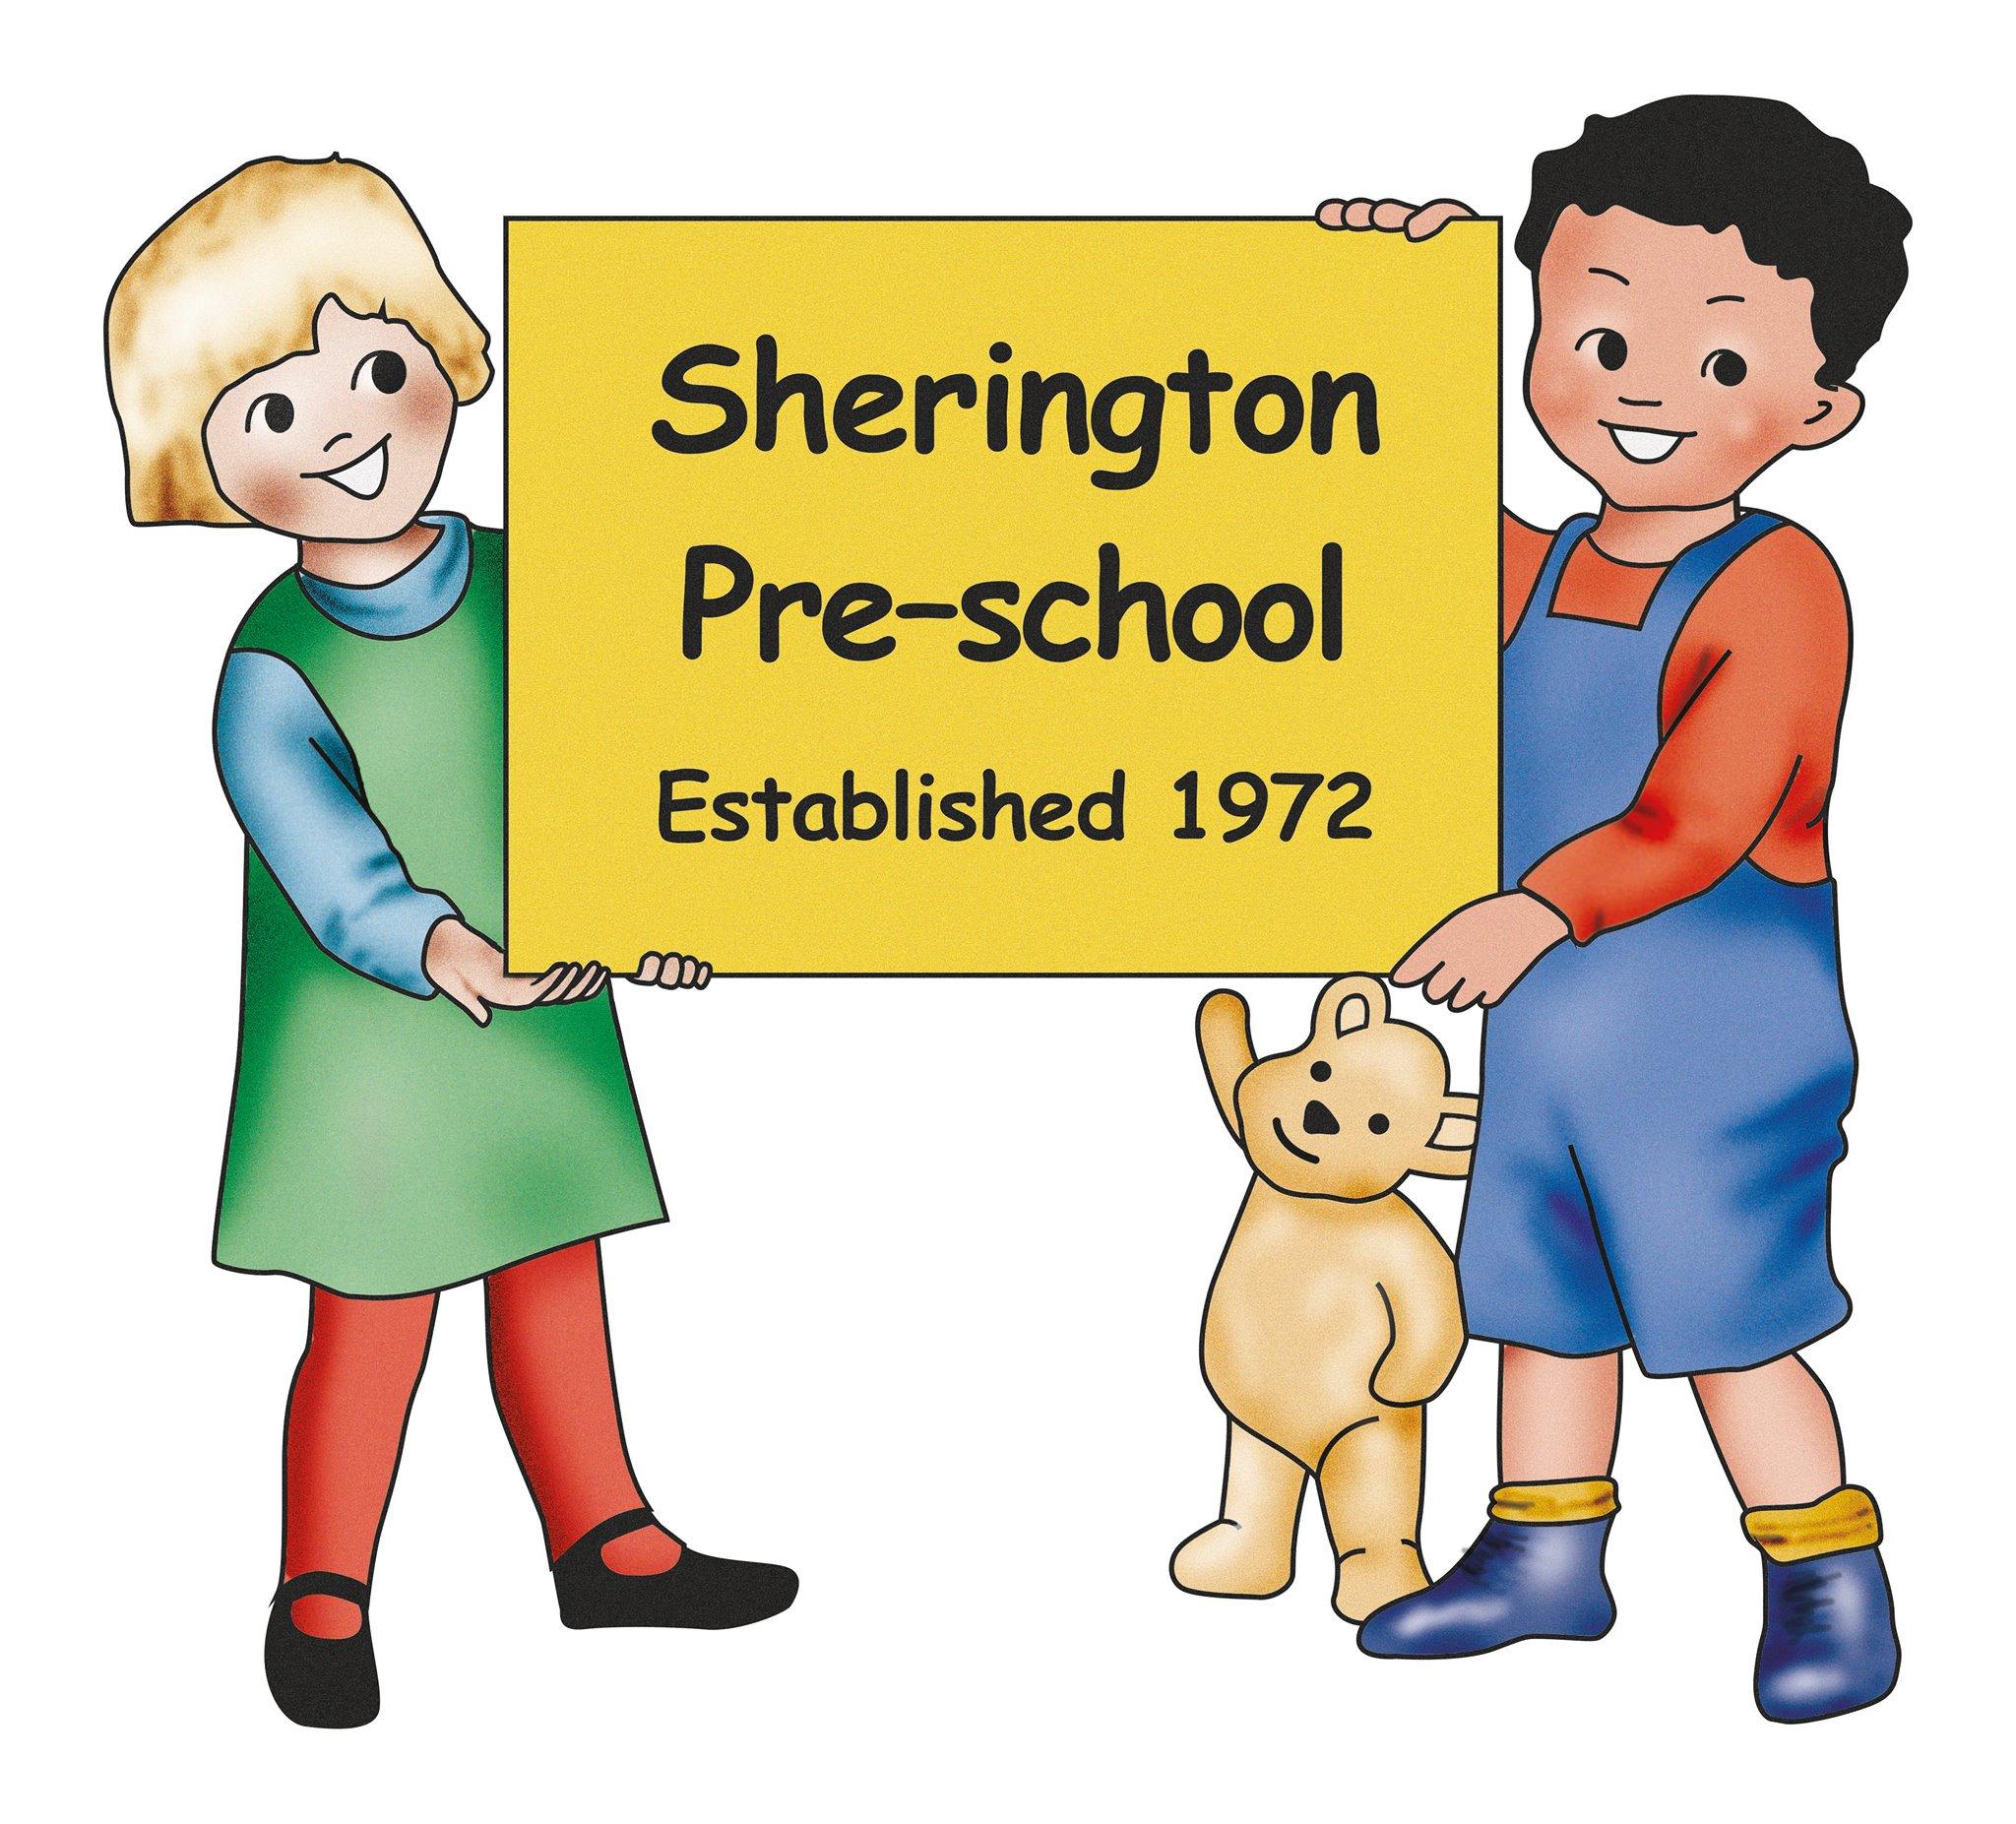 Sherington Pre-School's logo